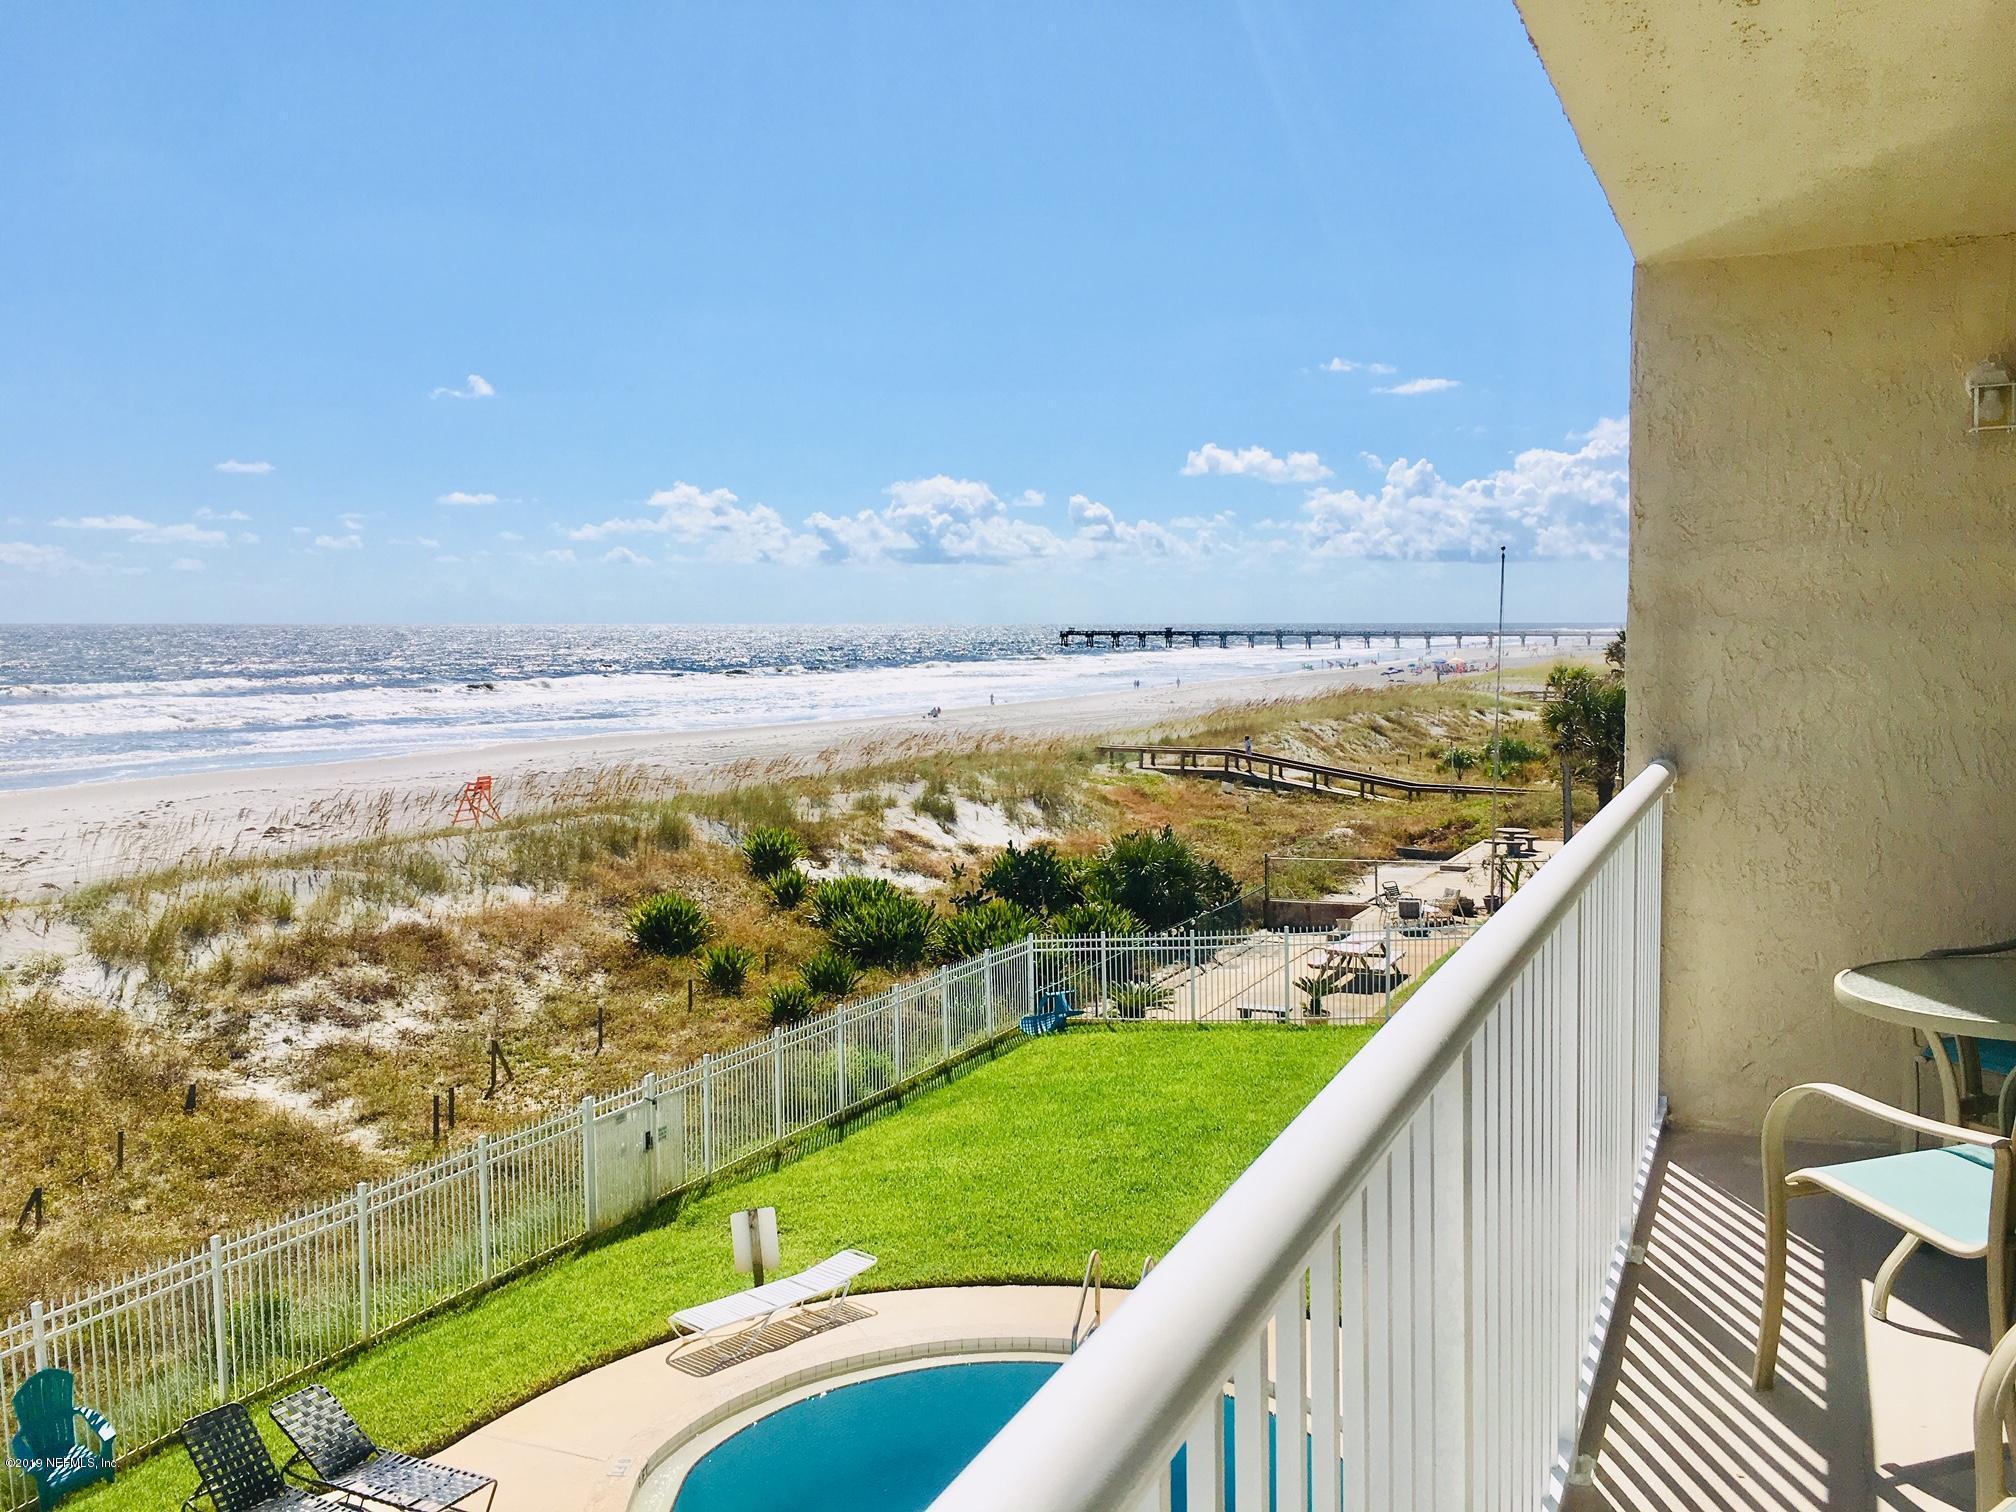 10 N 11TH AVE  305, Jacksonville Beach, Florida